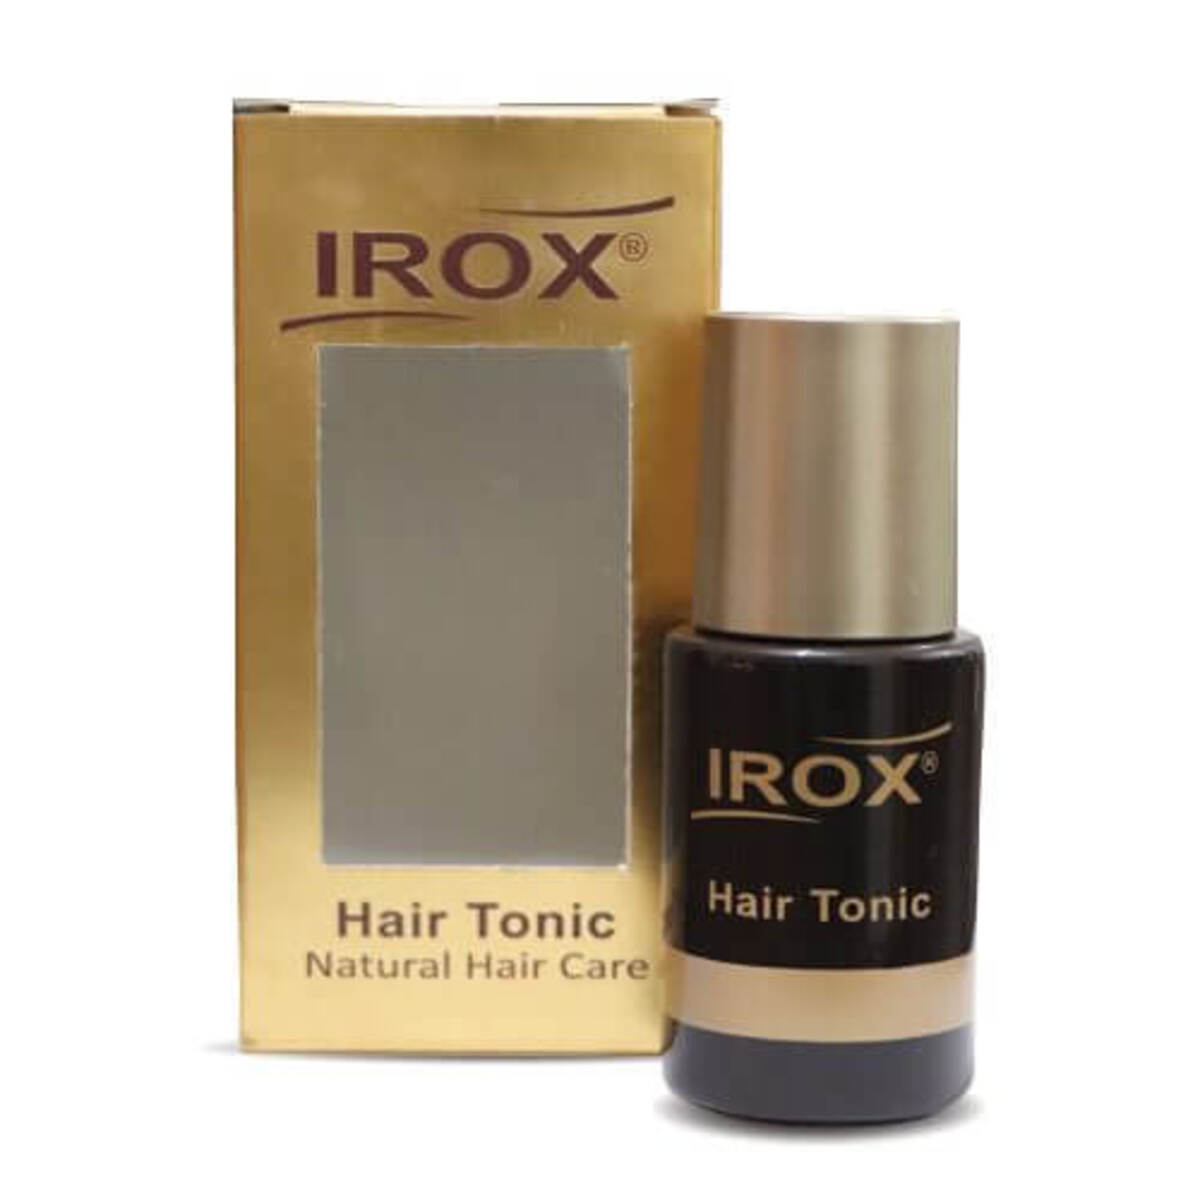 لوسیون تقویت کننده گیاهی موی سر و ابرو ایروکس